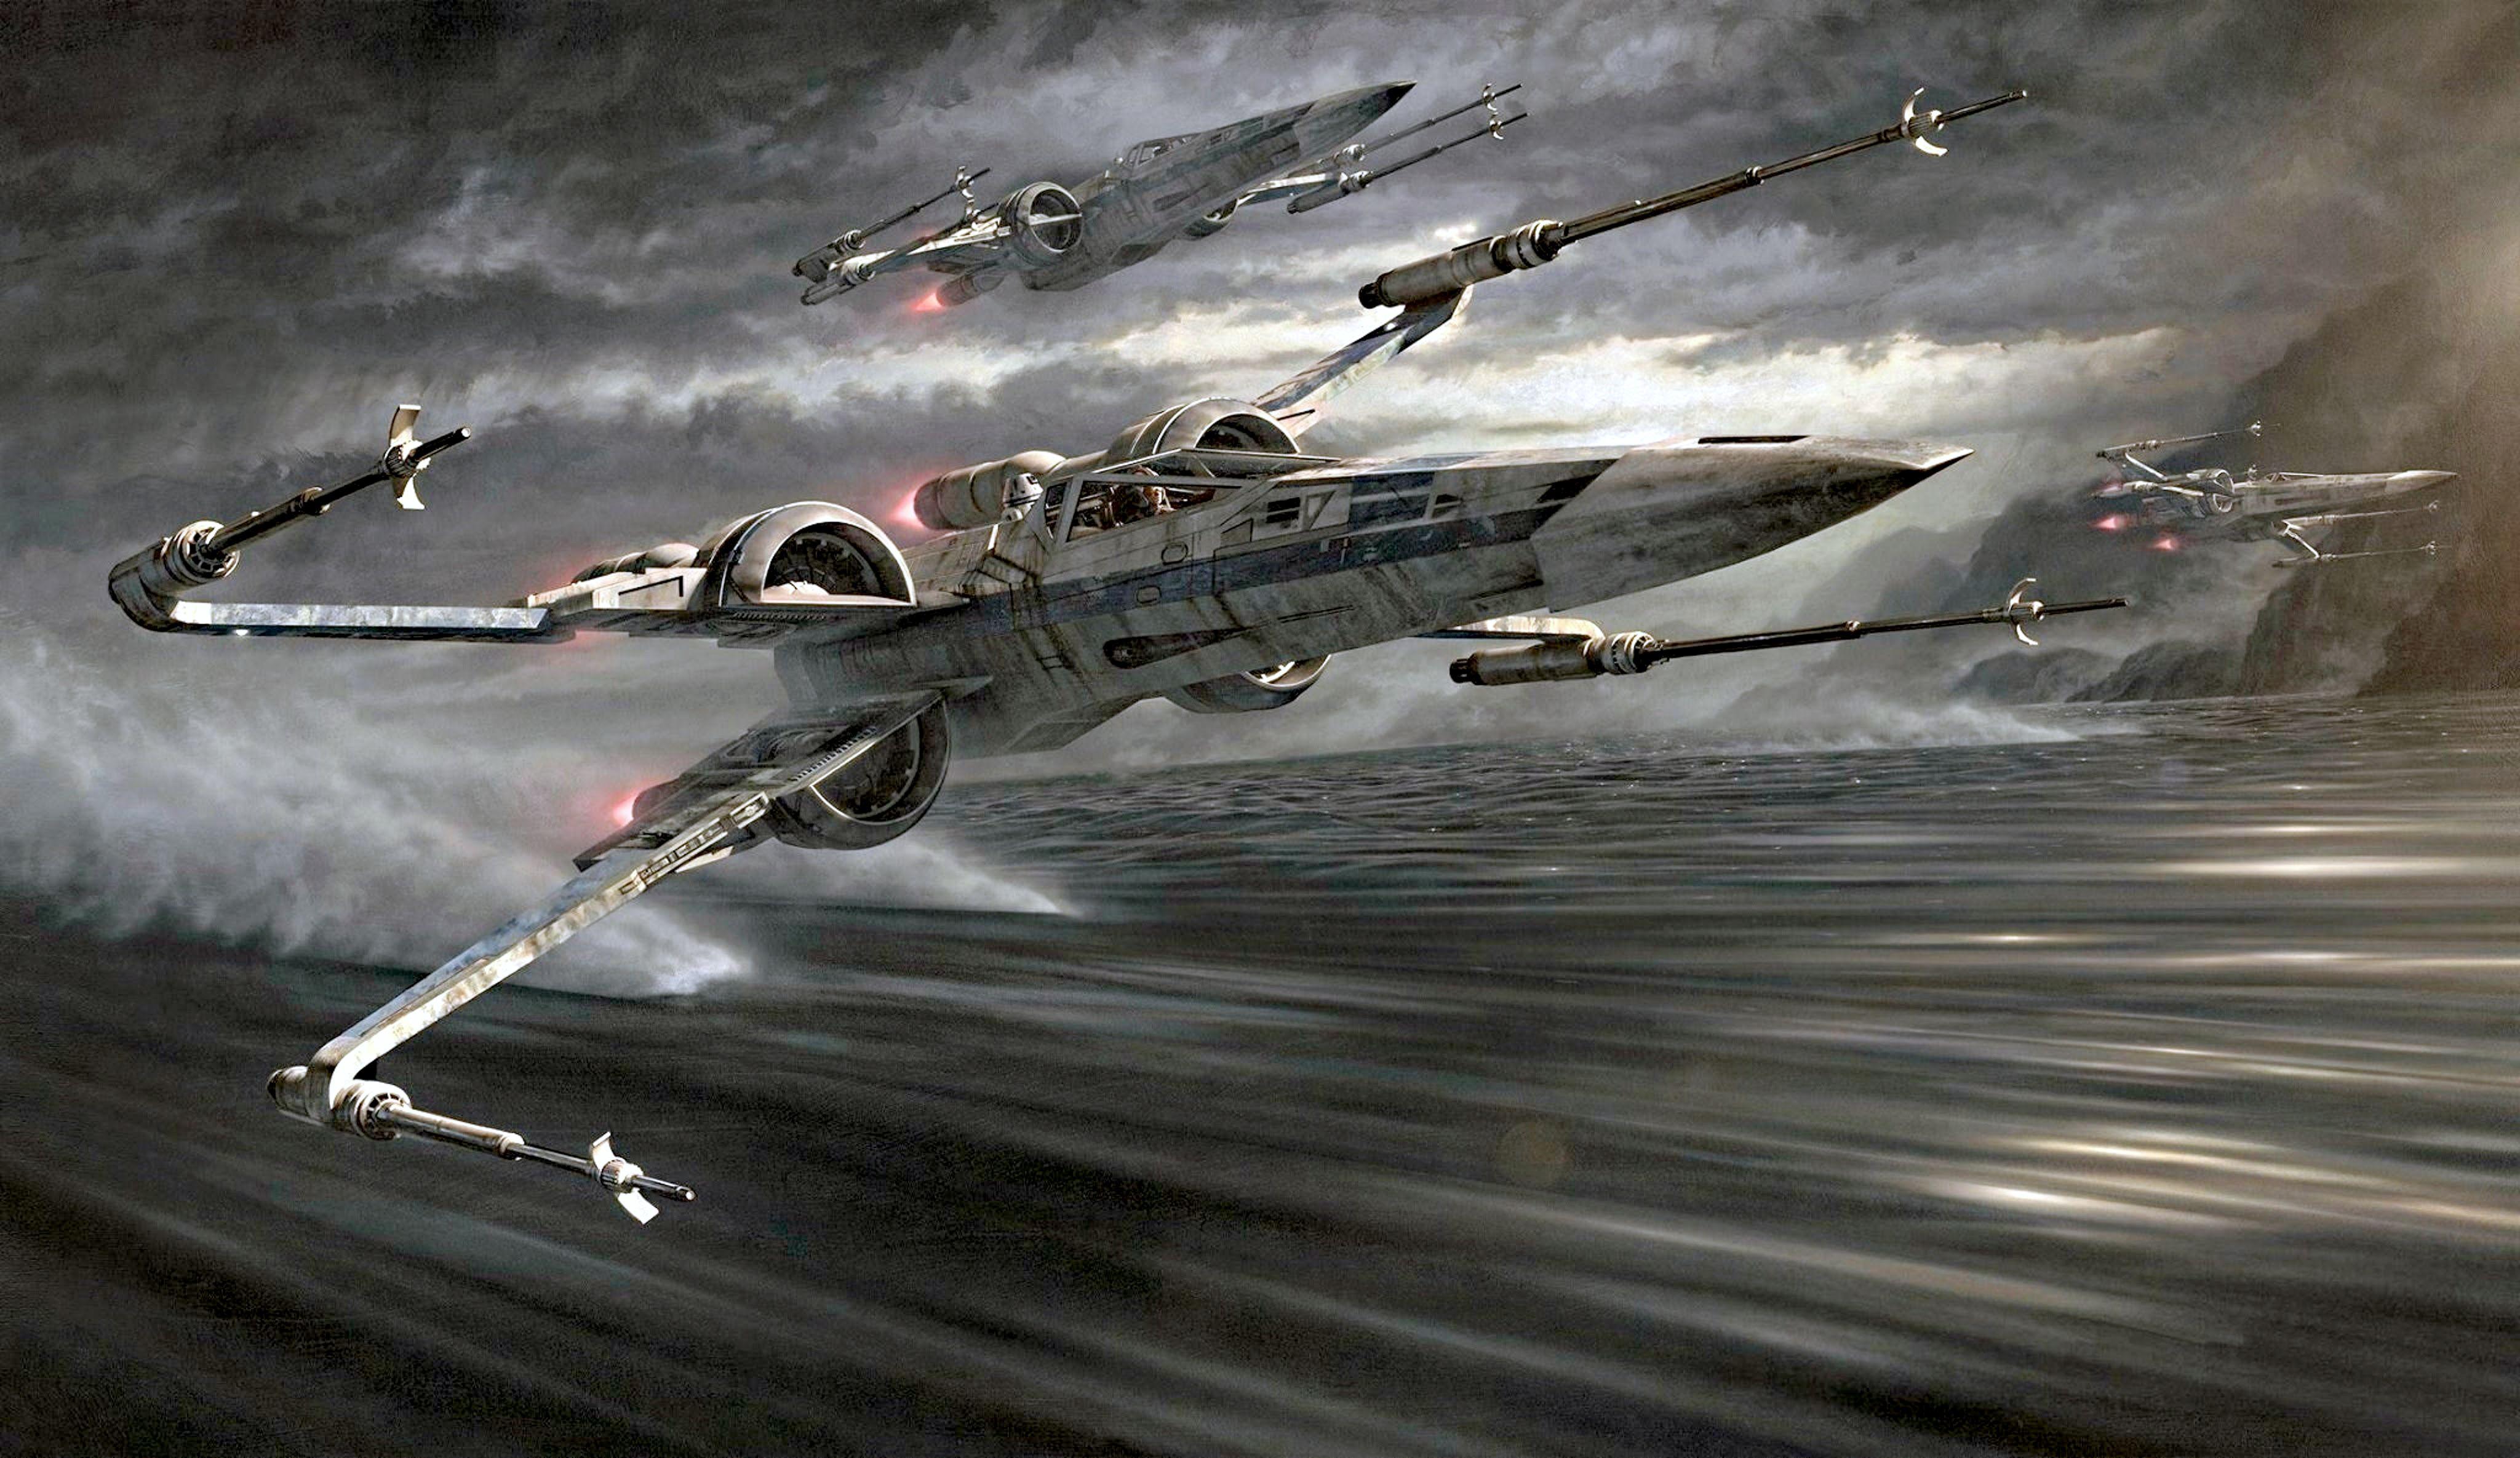 Star Wars Skimming X Wing Fighters Star Wars Illustration Star Wars Wallpaper Star Wars Ships